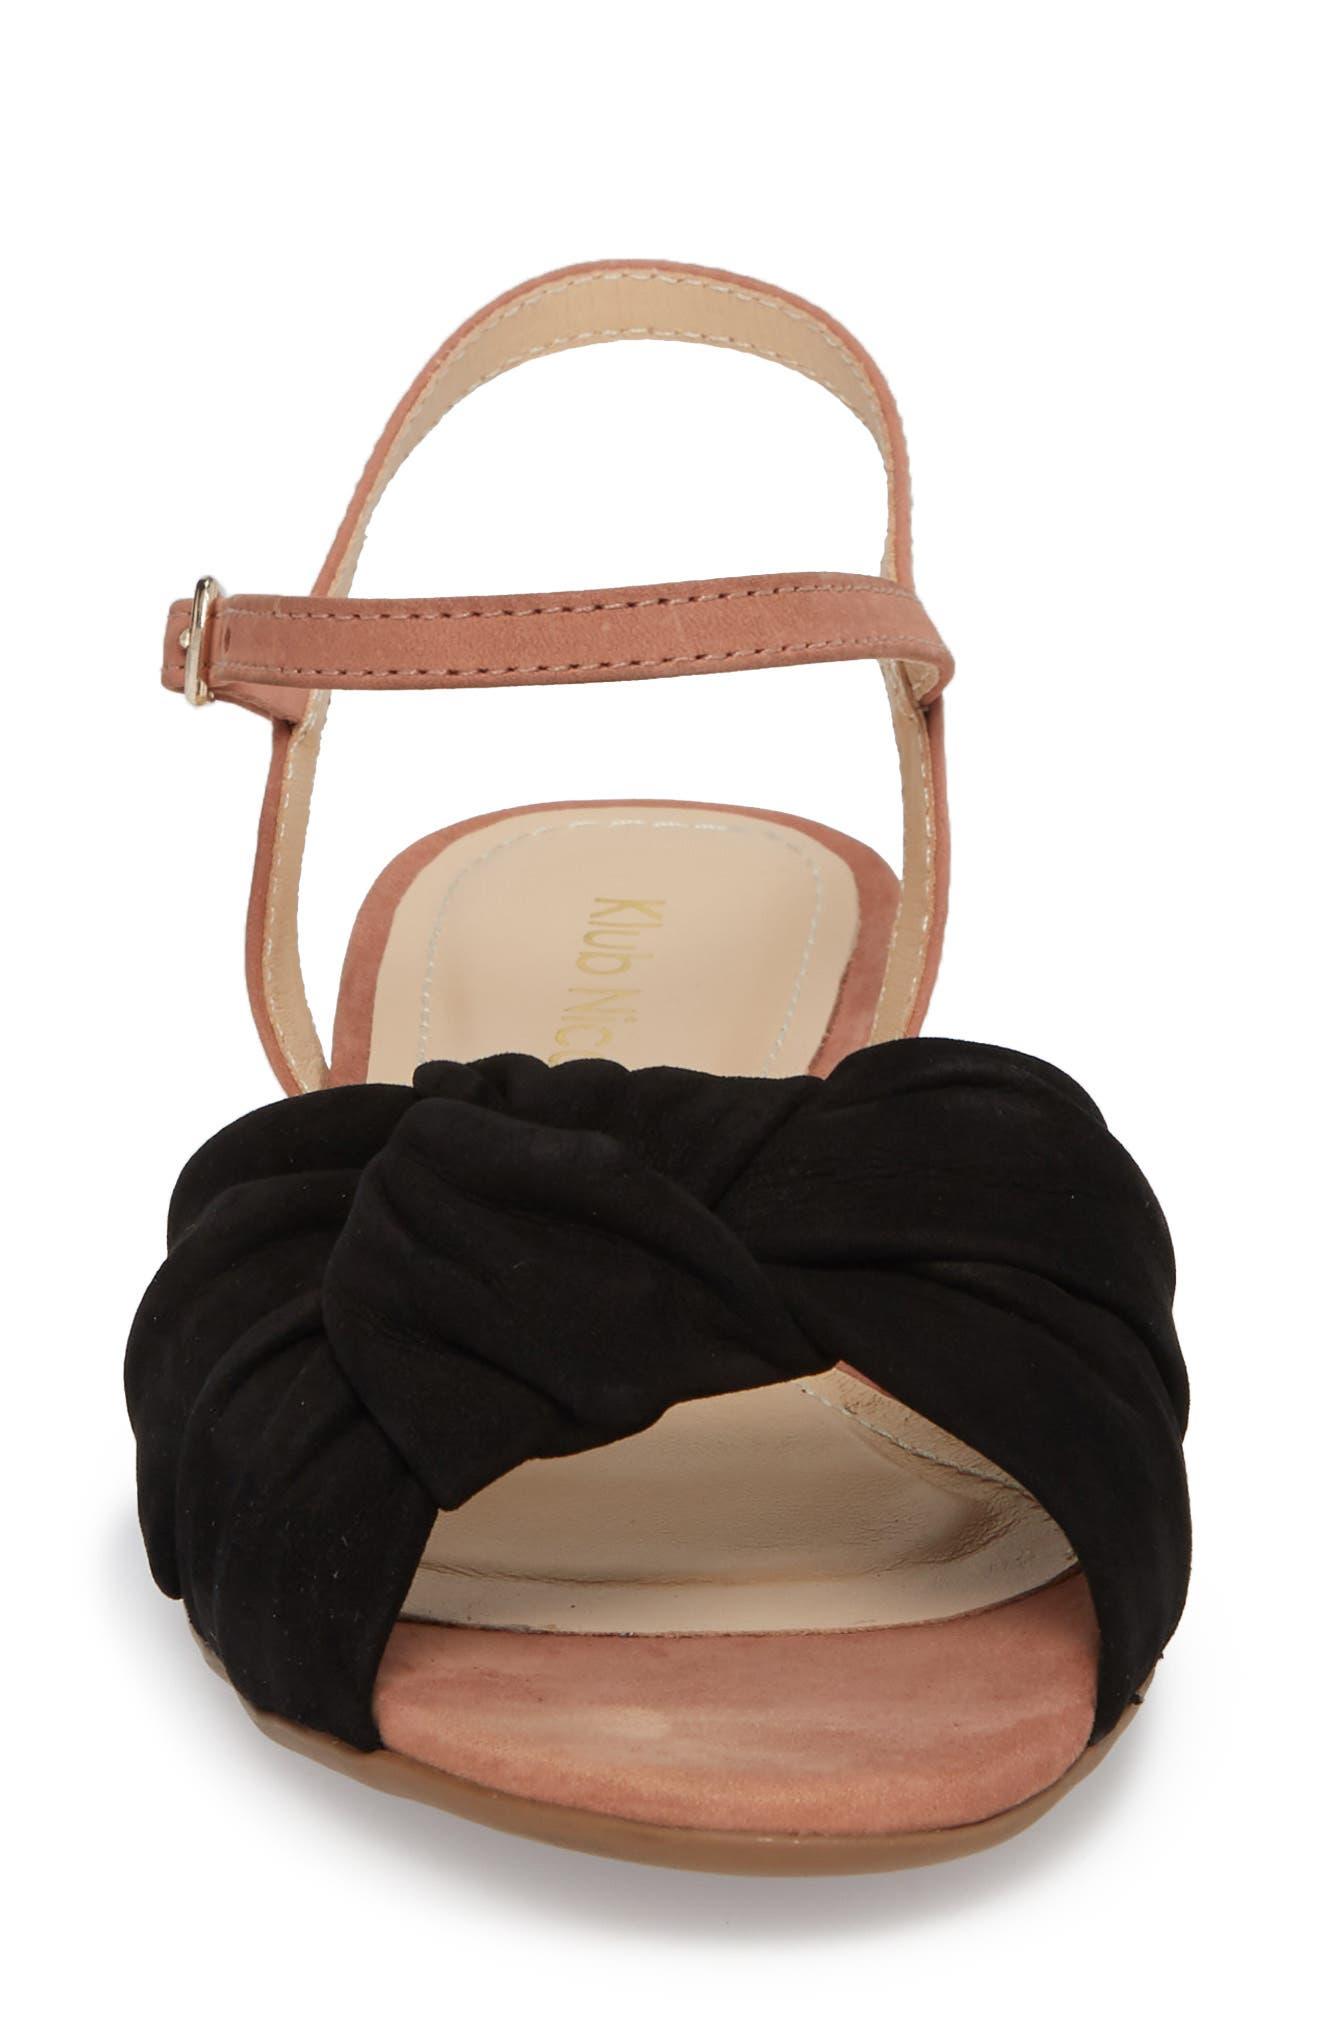 Giley Sandal,                             Alternate thumbnail 4, color,                             Black Nubuck Leather